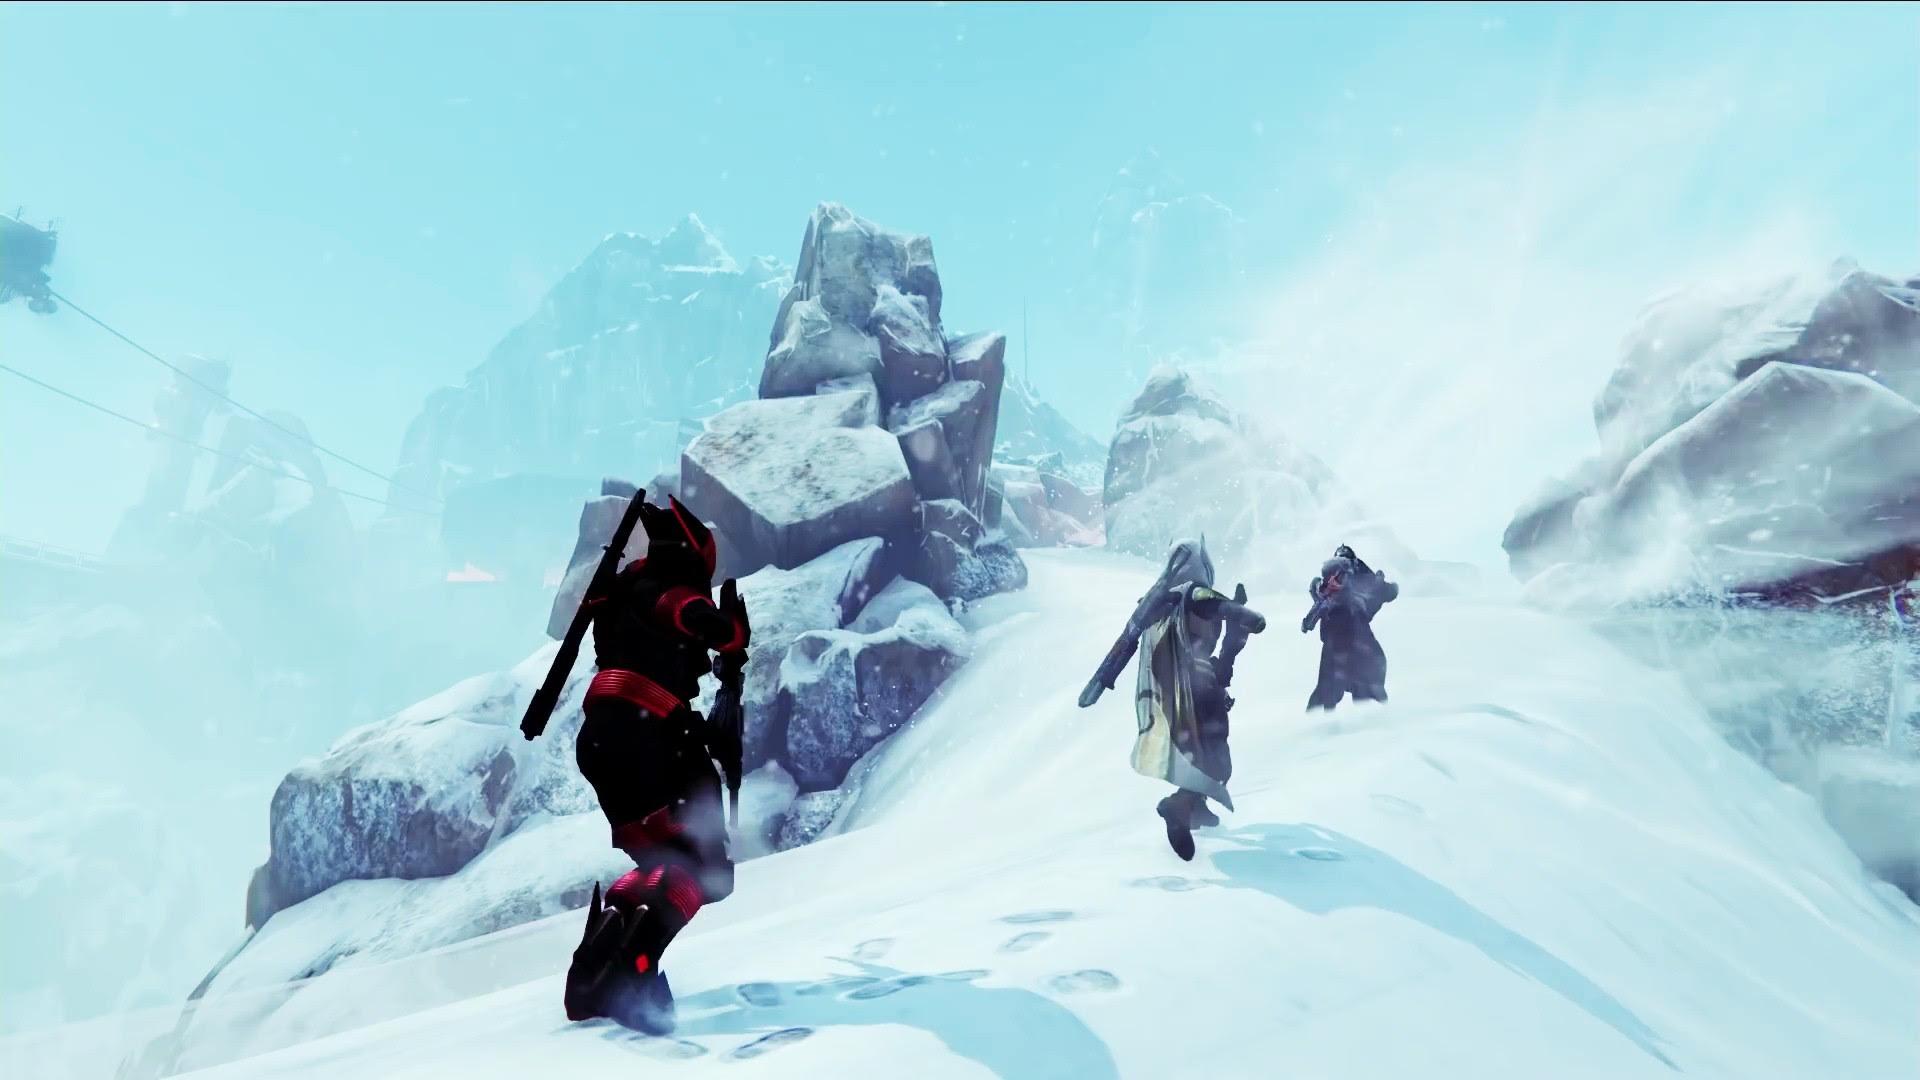 Destiny Rise Of Iron Snow Wallpaper 00678 Baltana